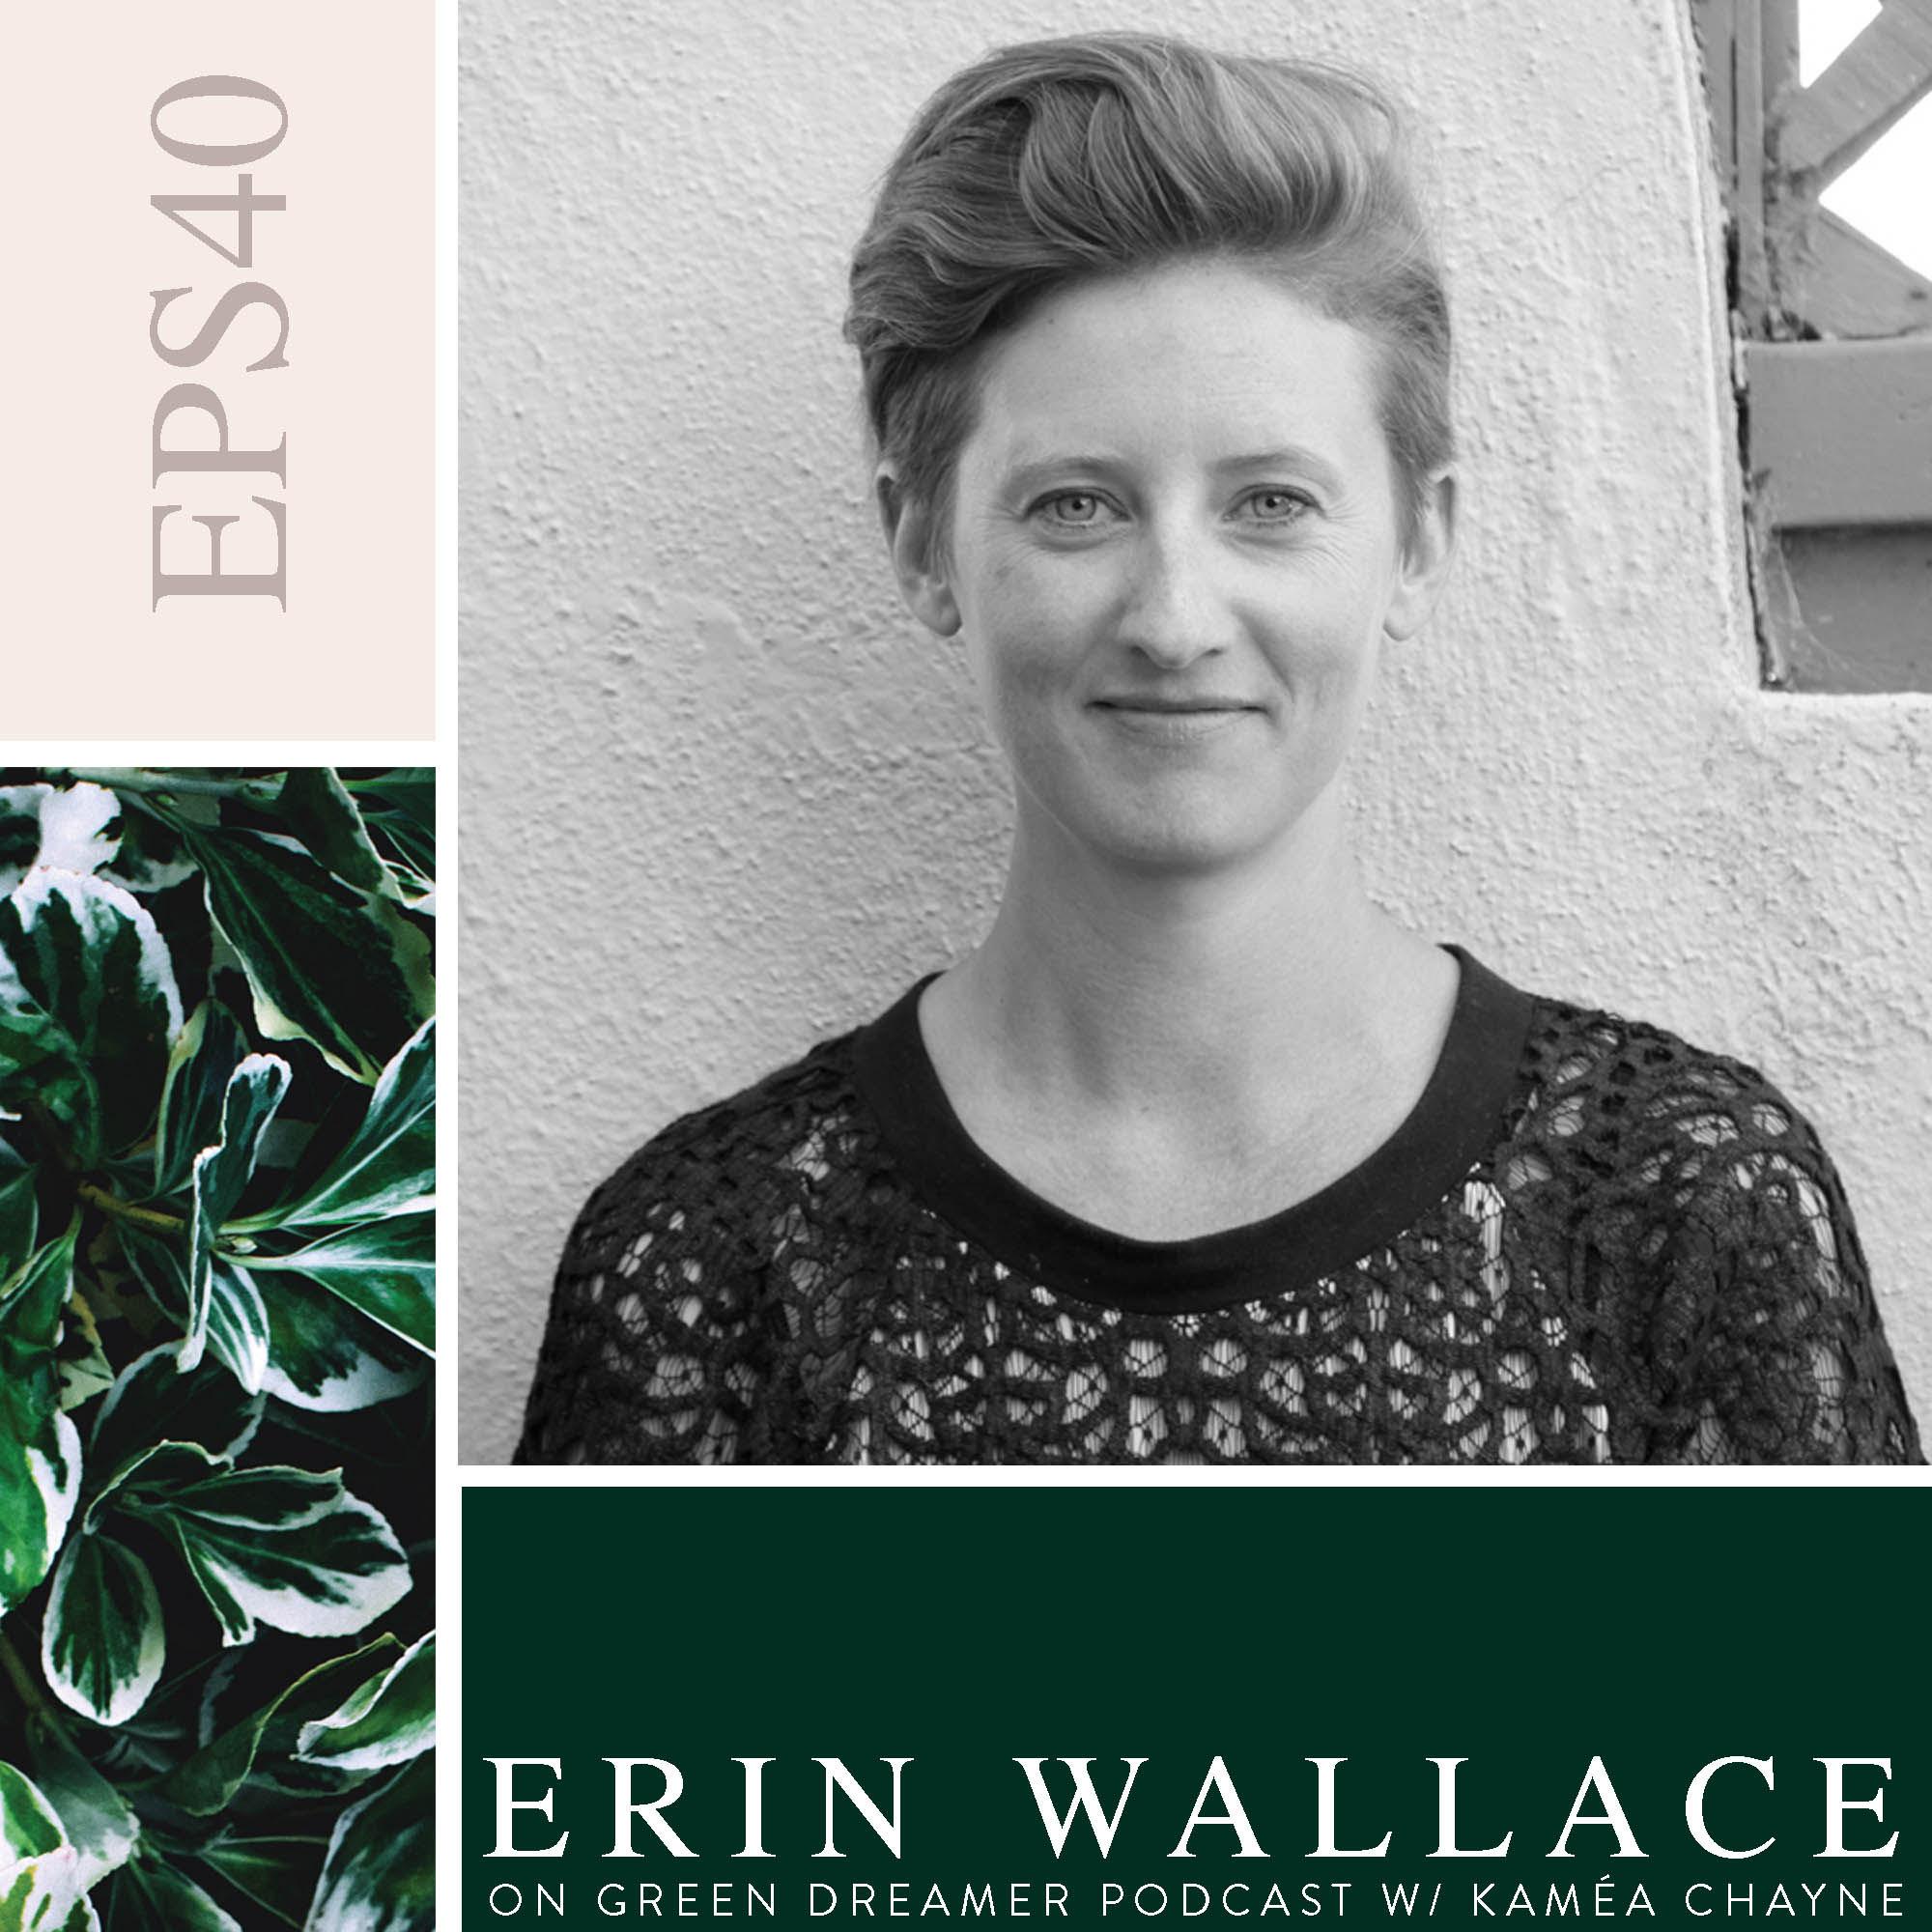 40) BW Erin-Wallace-of-thredUP-talks-sustainability-on-Green-Dreamer-Podcast-with-Kaméa-Chayne.jpg